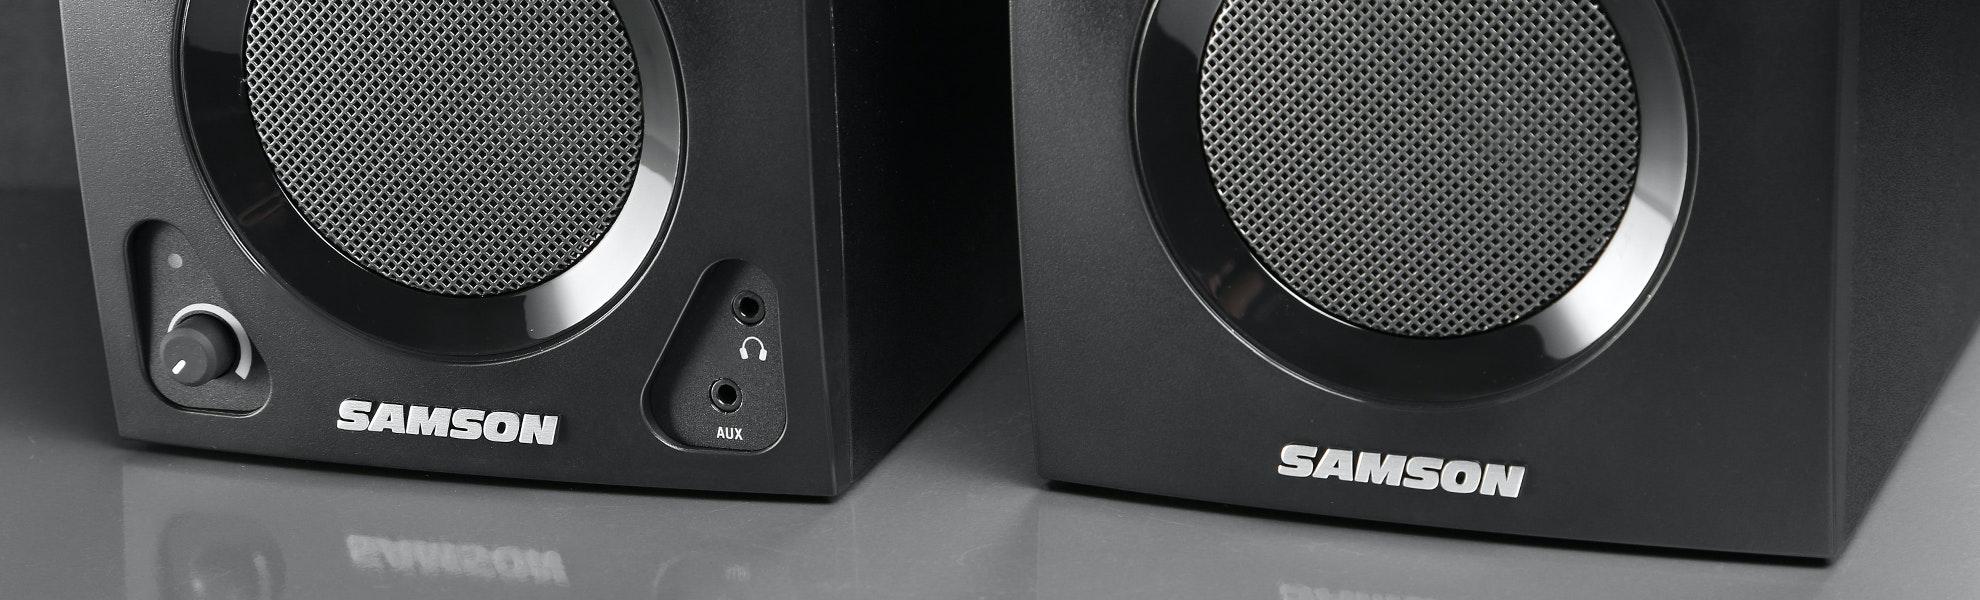 Samson MediaOne BT3 Active Studio Monitors